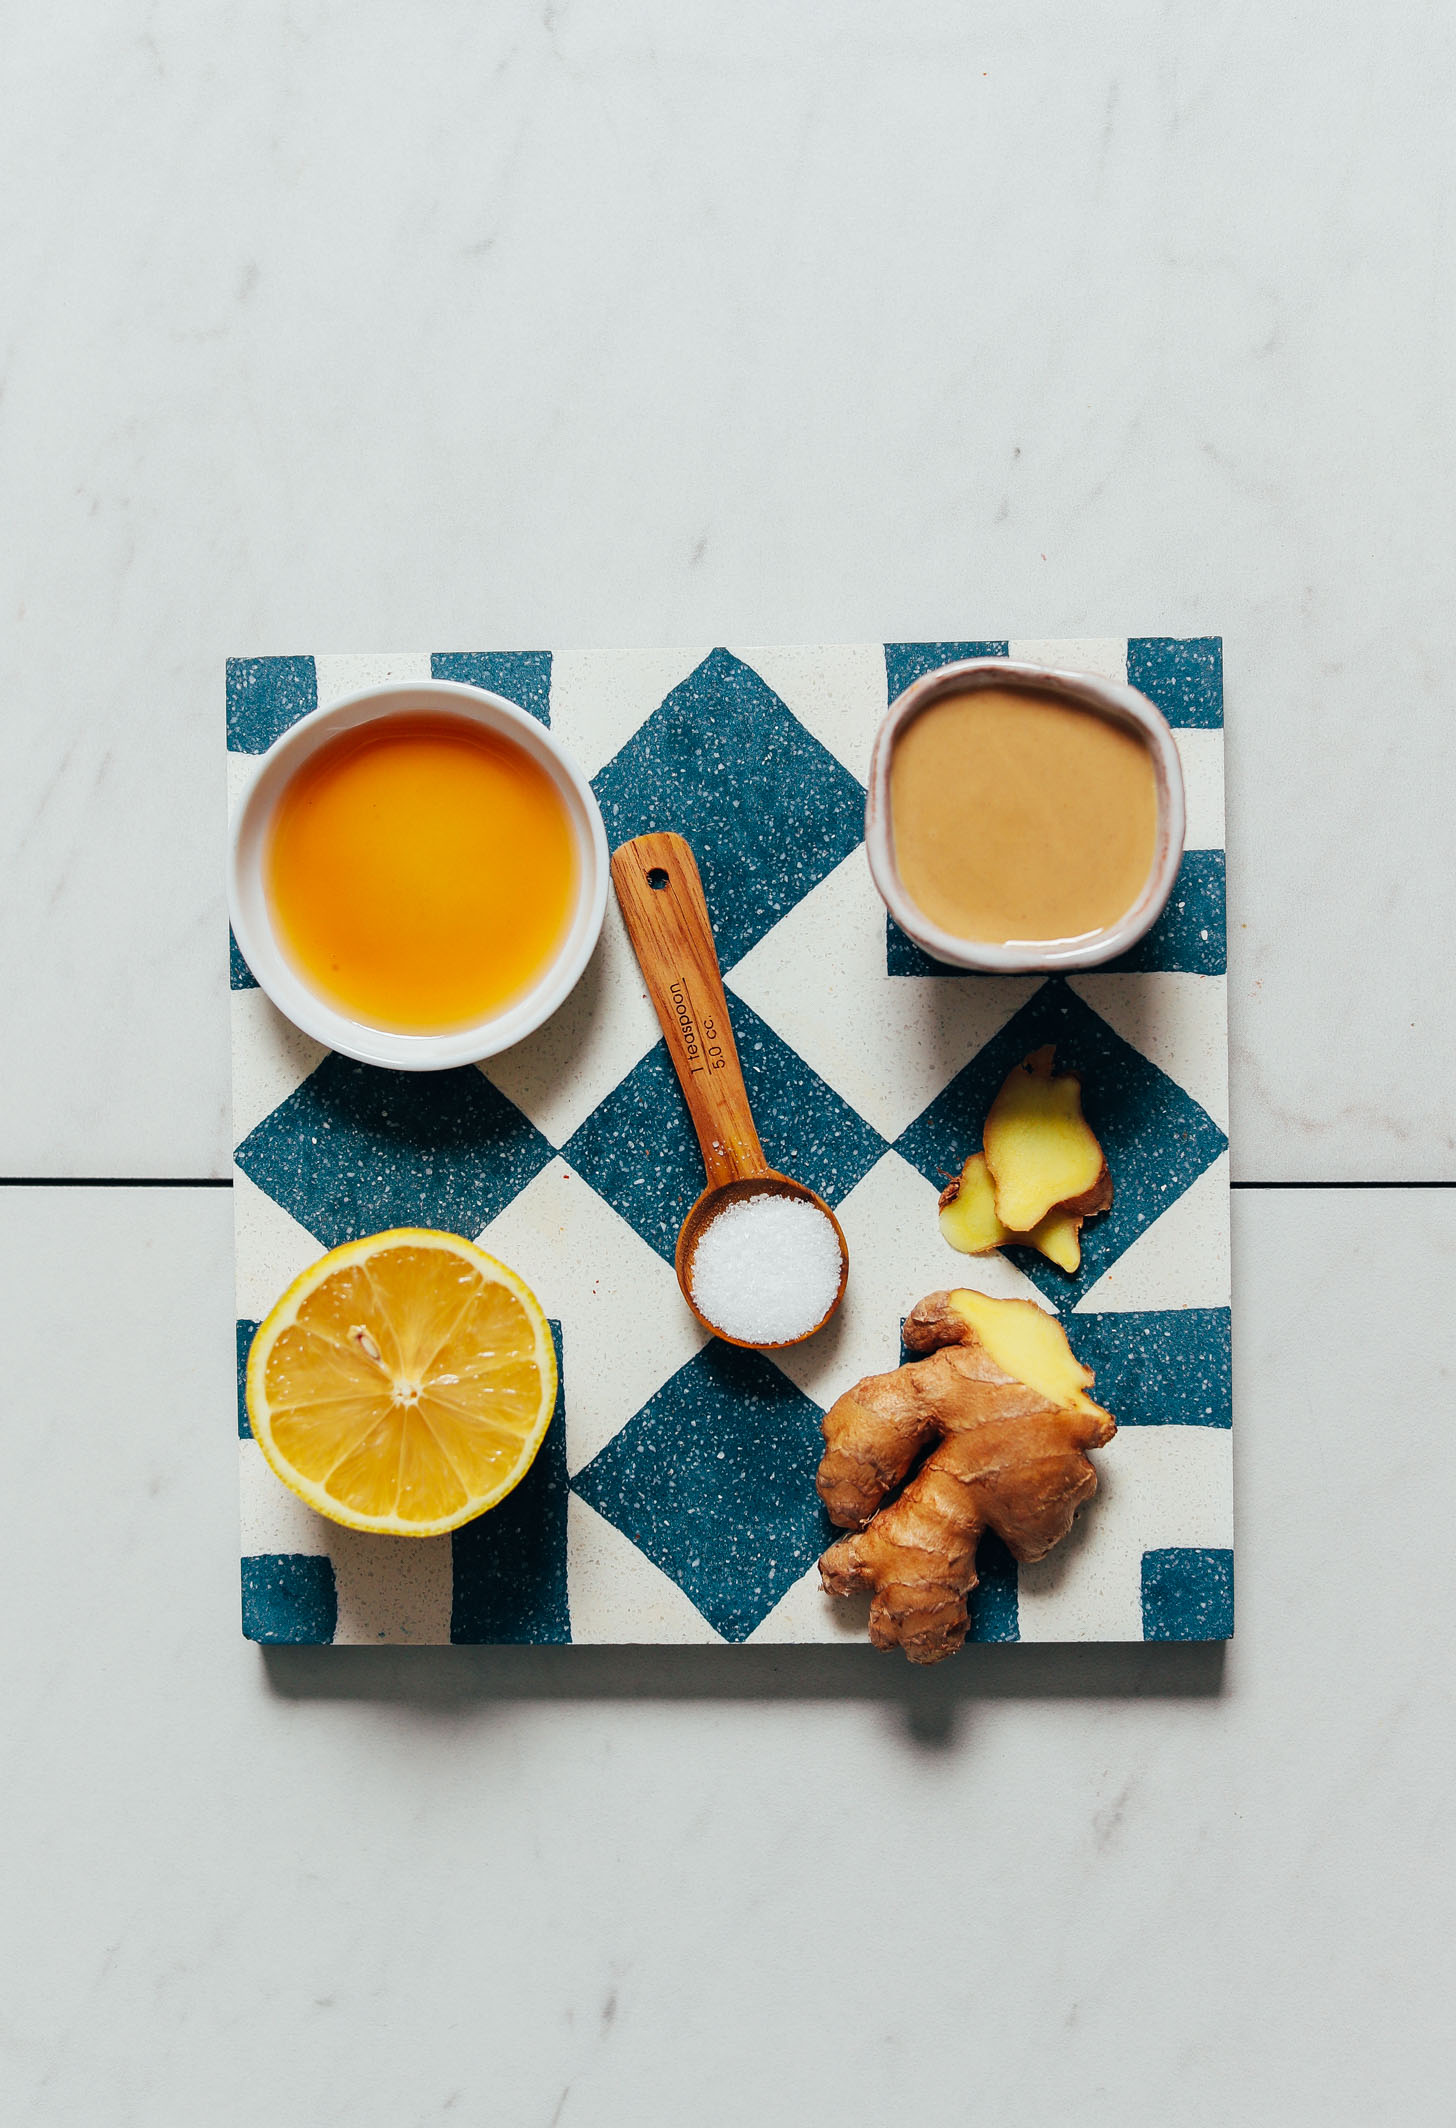 Maple syrup, tahini, lemon, salt, and ginger for making our easy Lemon Tahini Sauce recipe